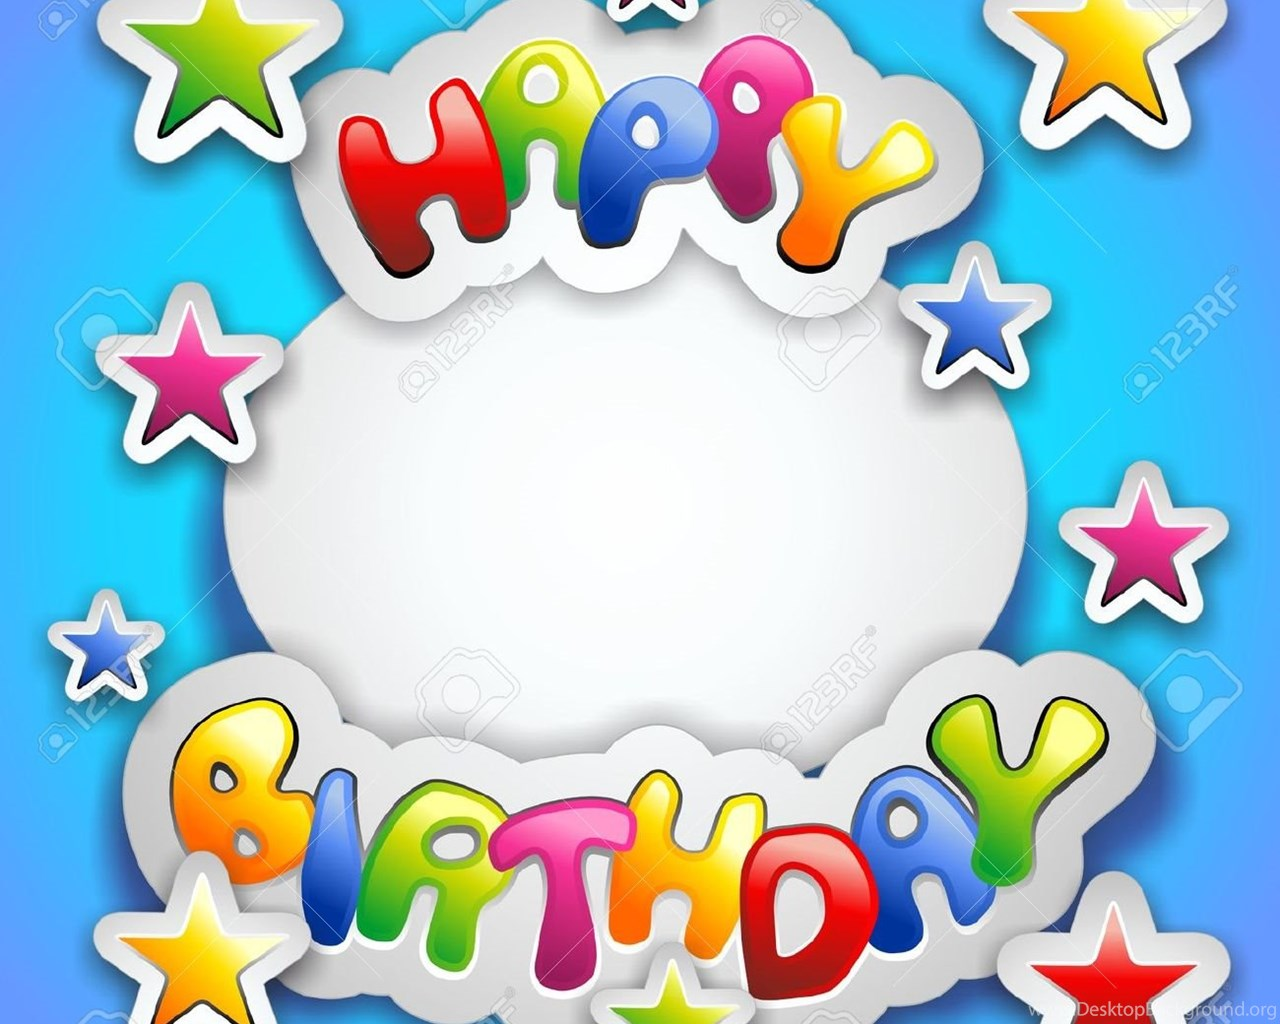 Image For Old Man Happy Birthday Clip Art Birthday